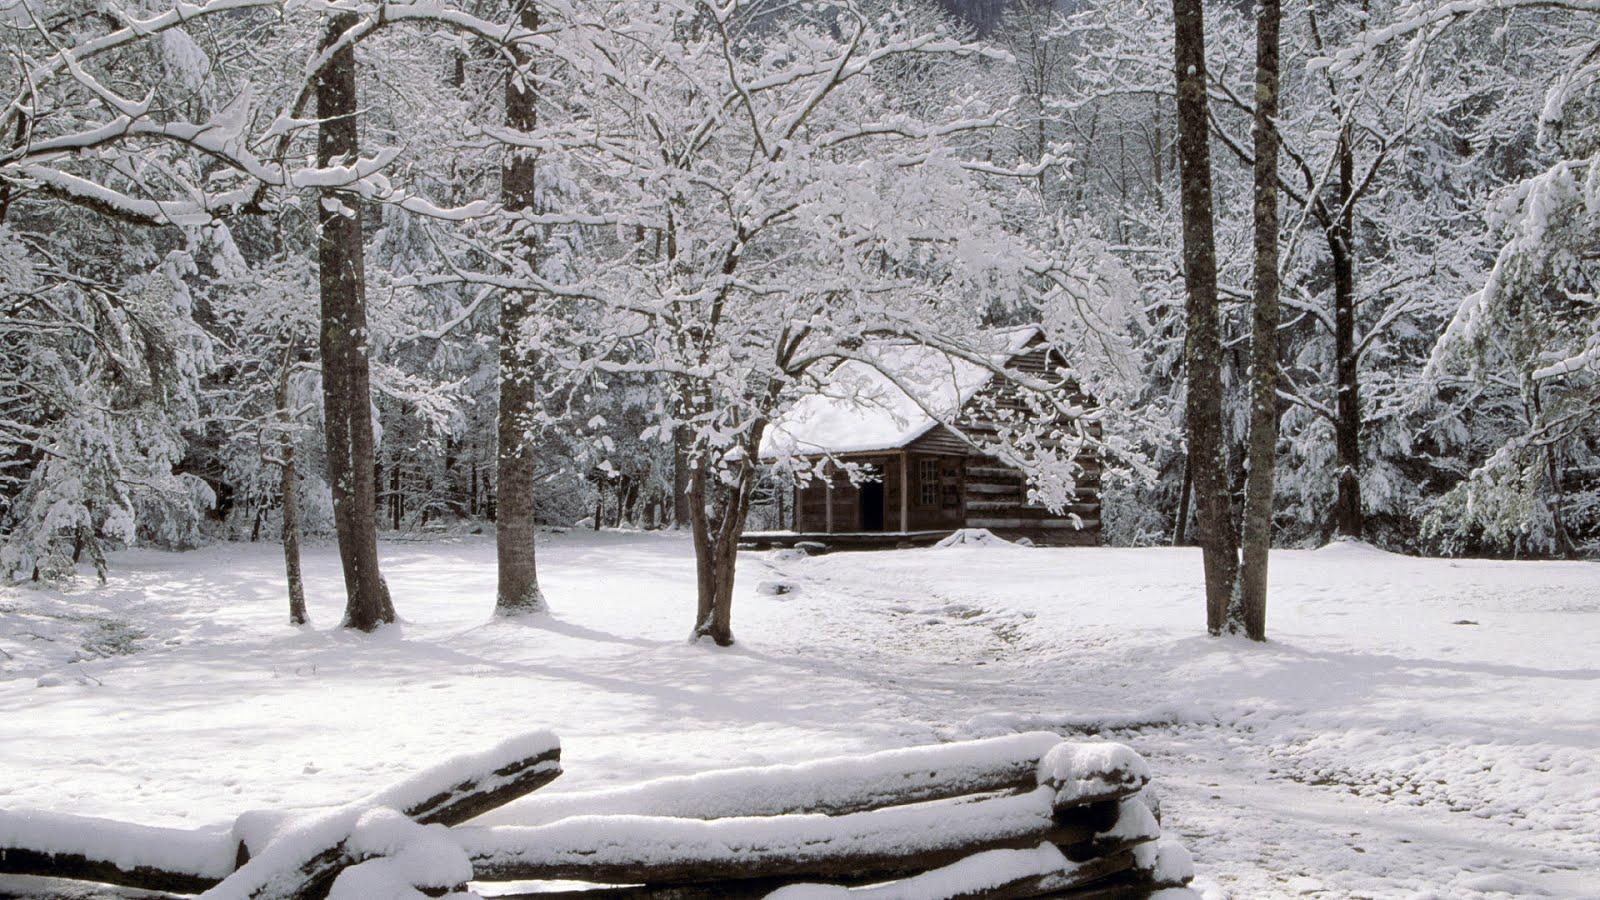 old cabin winter scene wallpaper - photo #30